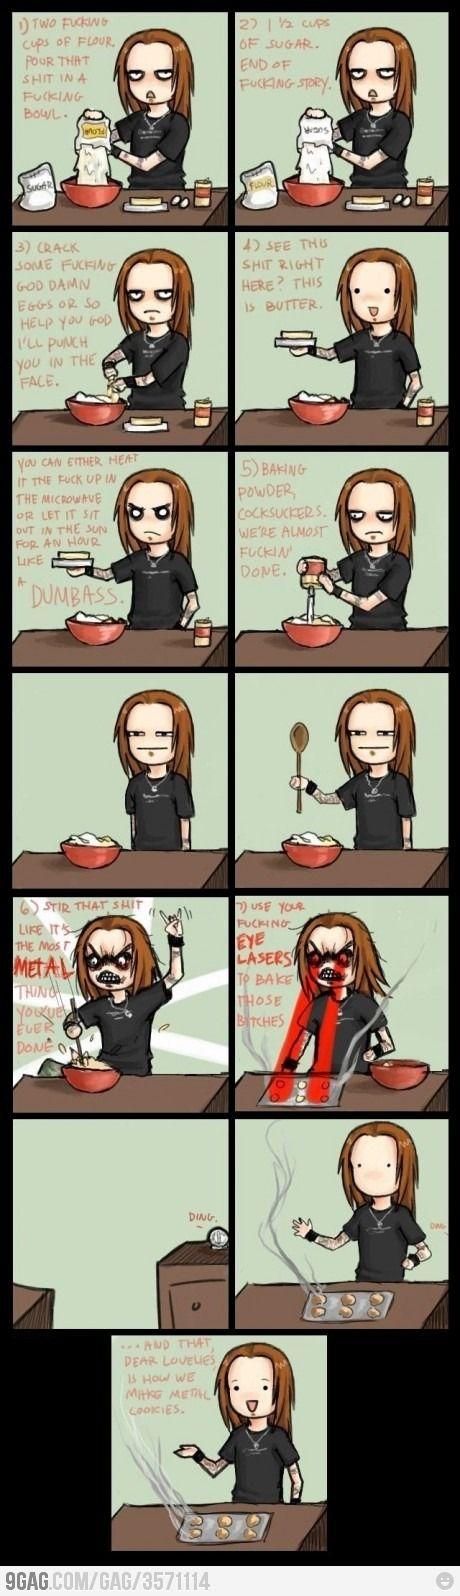 Favorite recipe: Metal cookies